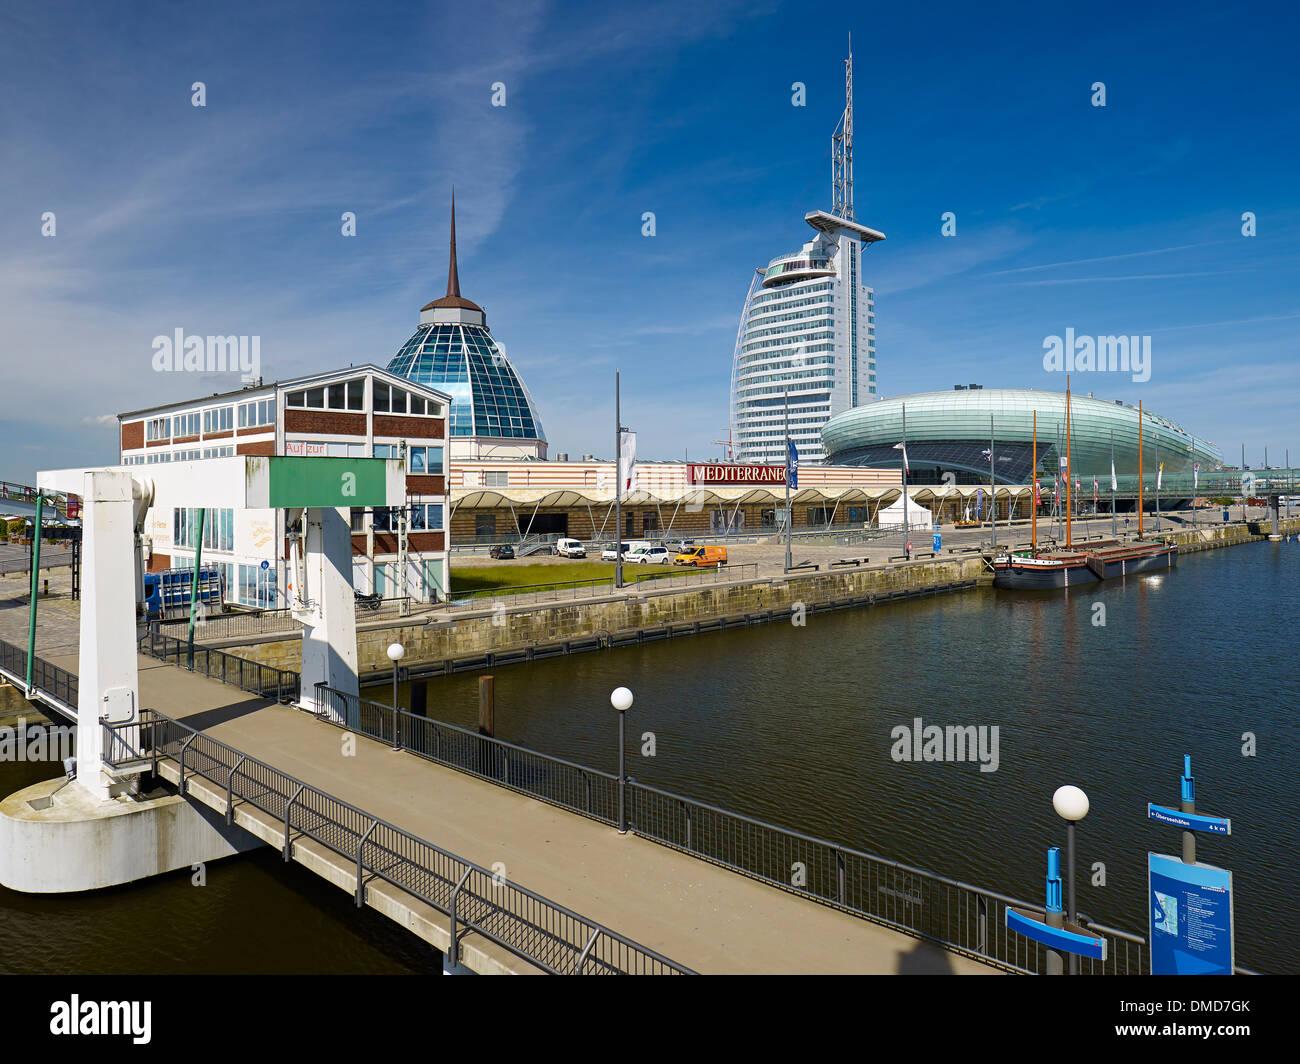 Klimahaus, Atlantic Sail City Hotel and Mediterraneo, Bremerhaven, Bremen, Germany - Stock Image